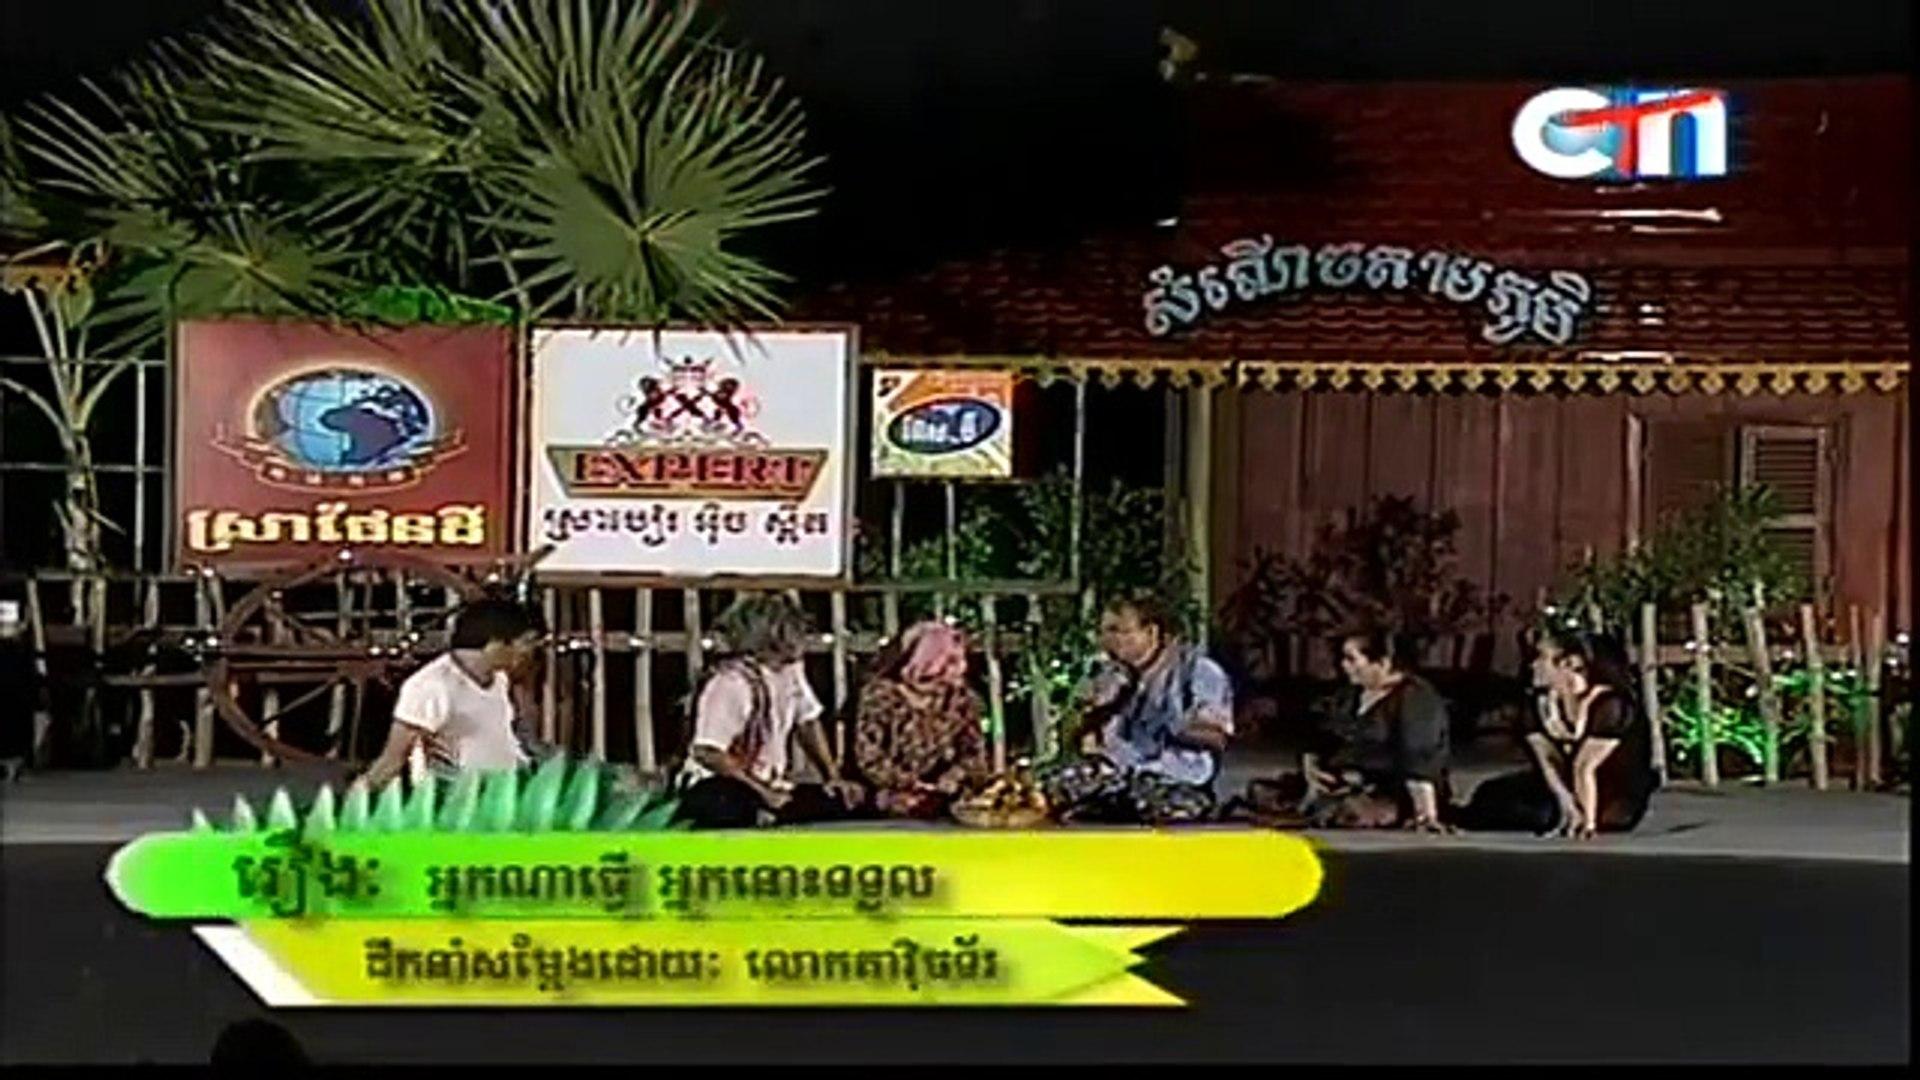 Neakna Tver Neak Nus Tor Toul Khos Trov, 05 June 2016 Khmer Comedy, CTN Comedy, Pekmi Comedy